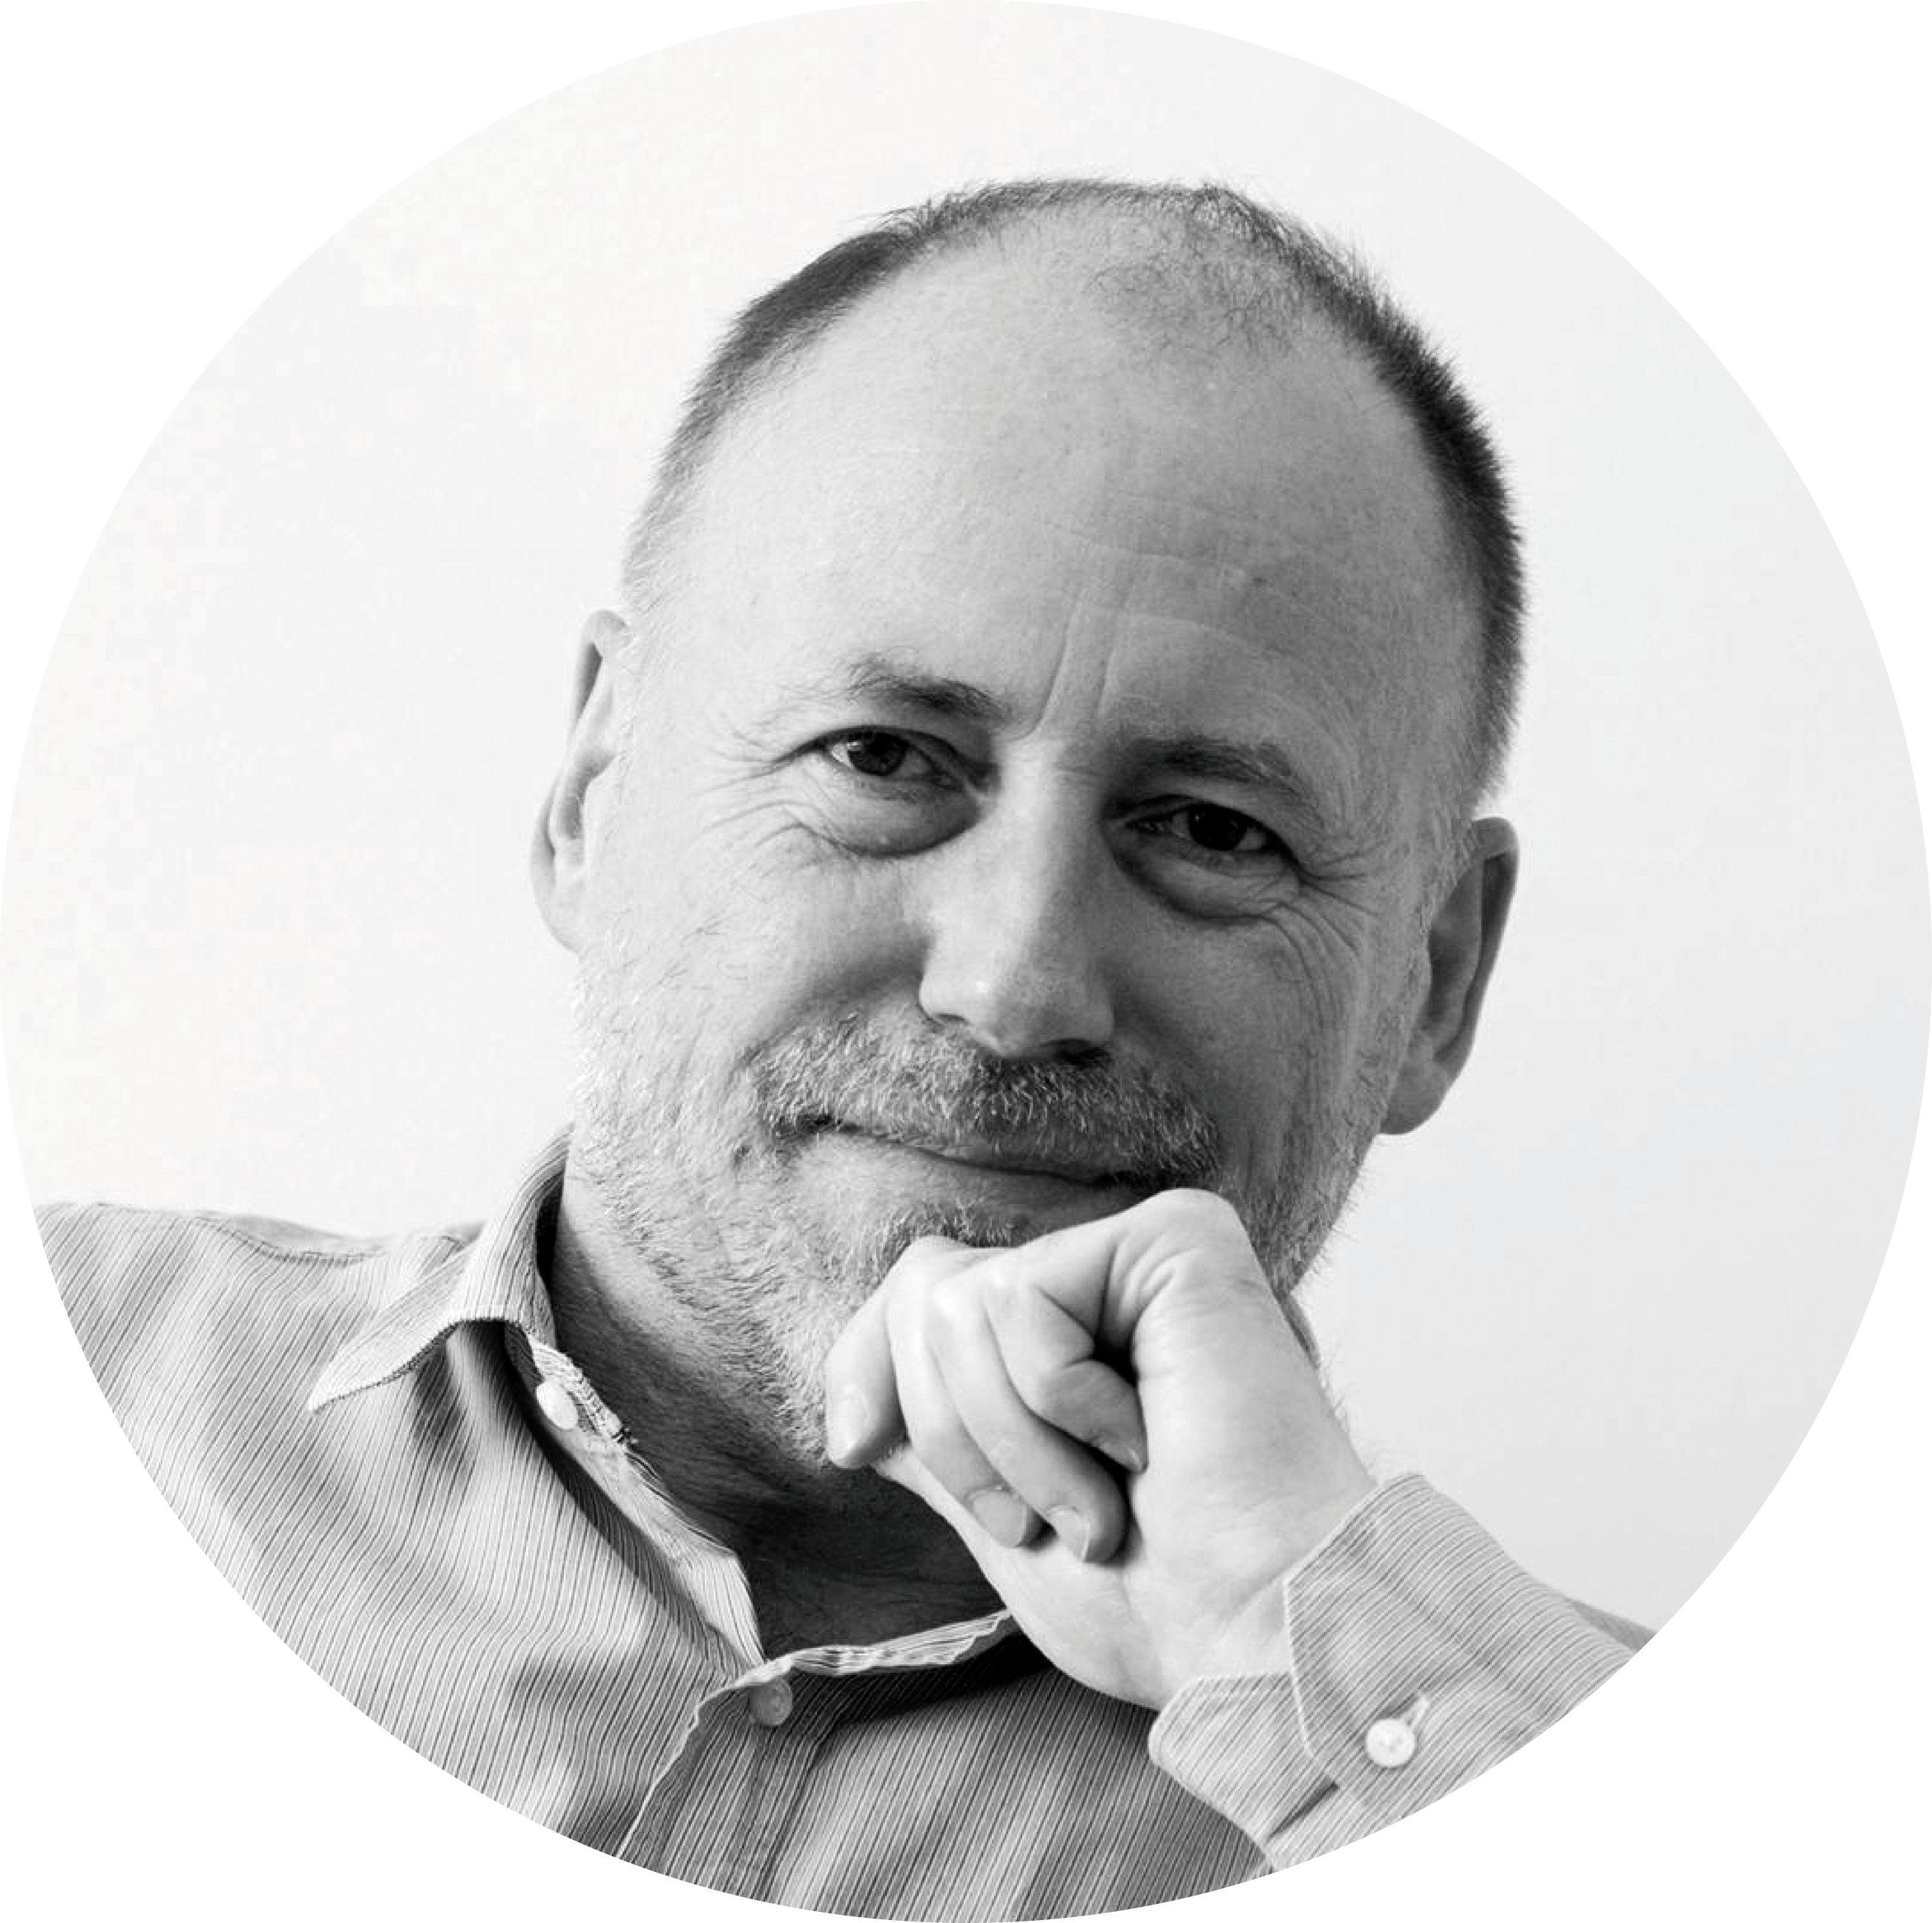 prof. dr hab. Michał Stefanowski